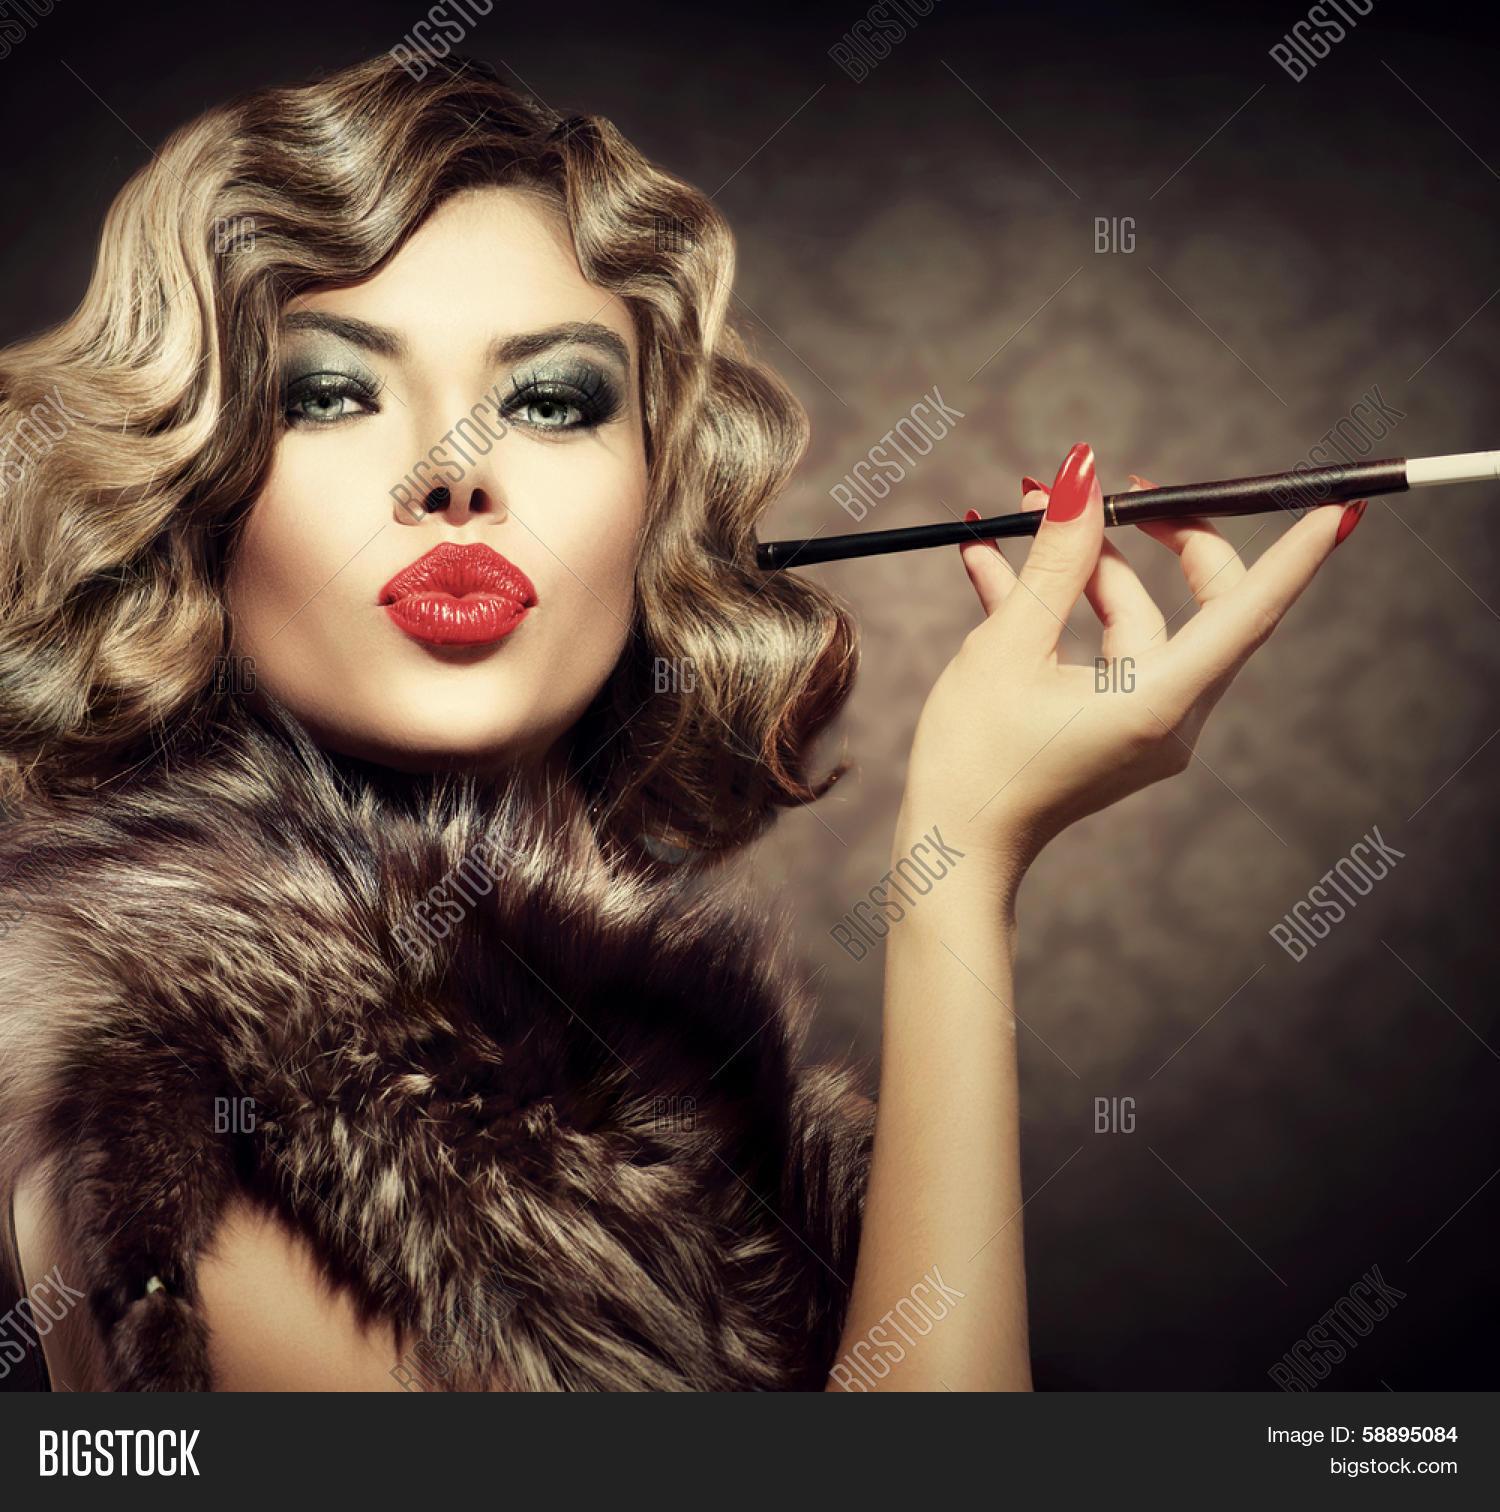 Beauty Retro Woman Mouthpiece. Image & Photo | Bigstock